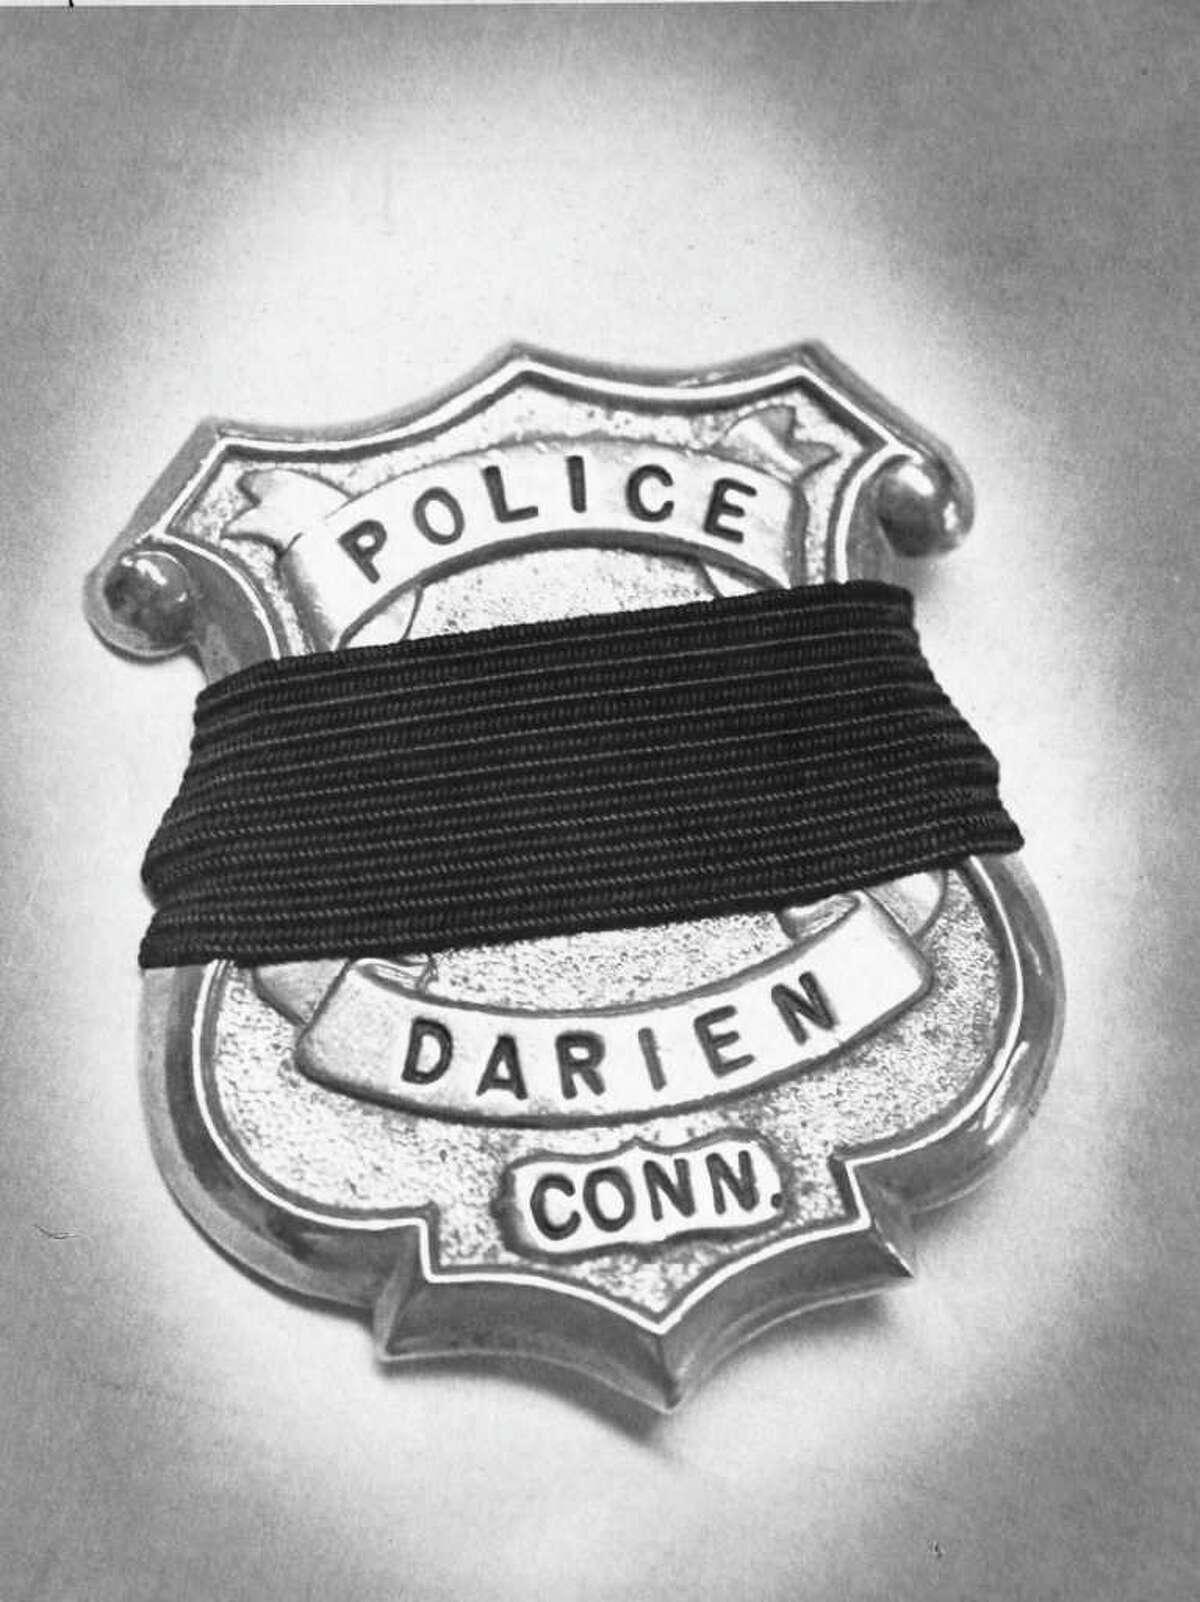 June 1981 - Darien police badge - Darien Policeman Kenneth Bateman slain during robbery at Duchess resturant in 1981